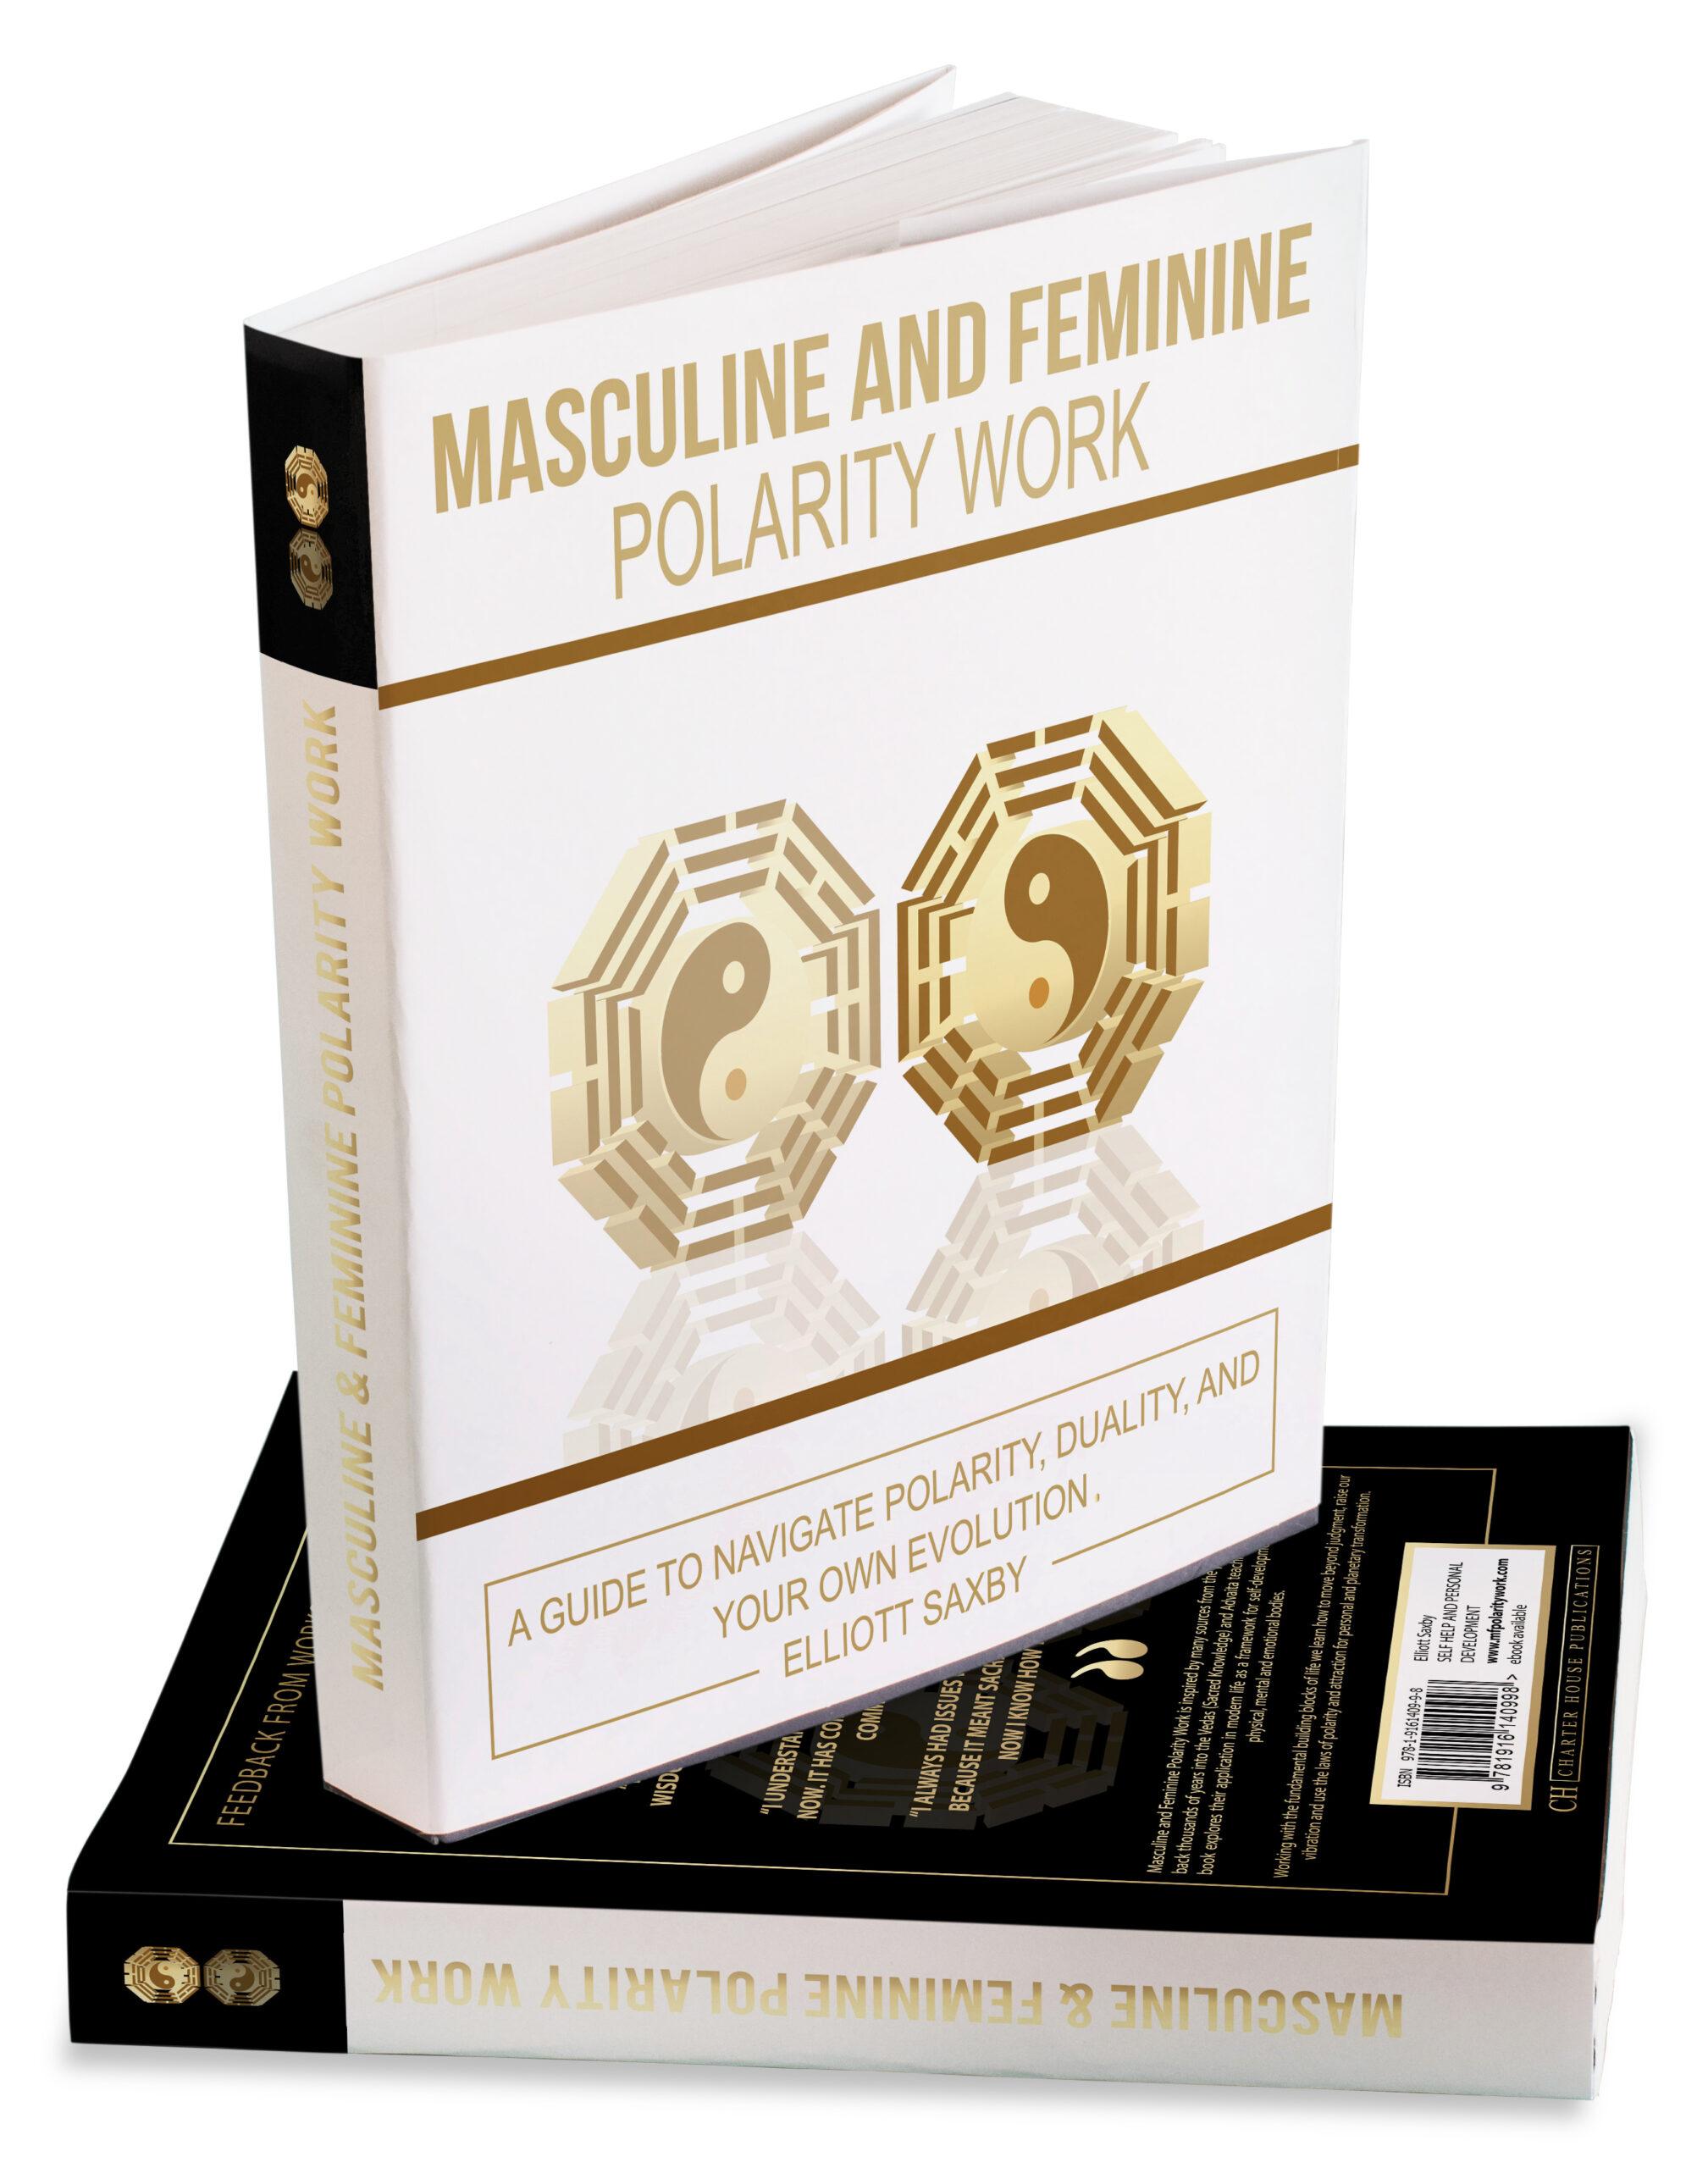 Masculine and Feminine Polarity Work Book